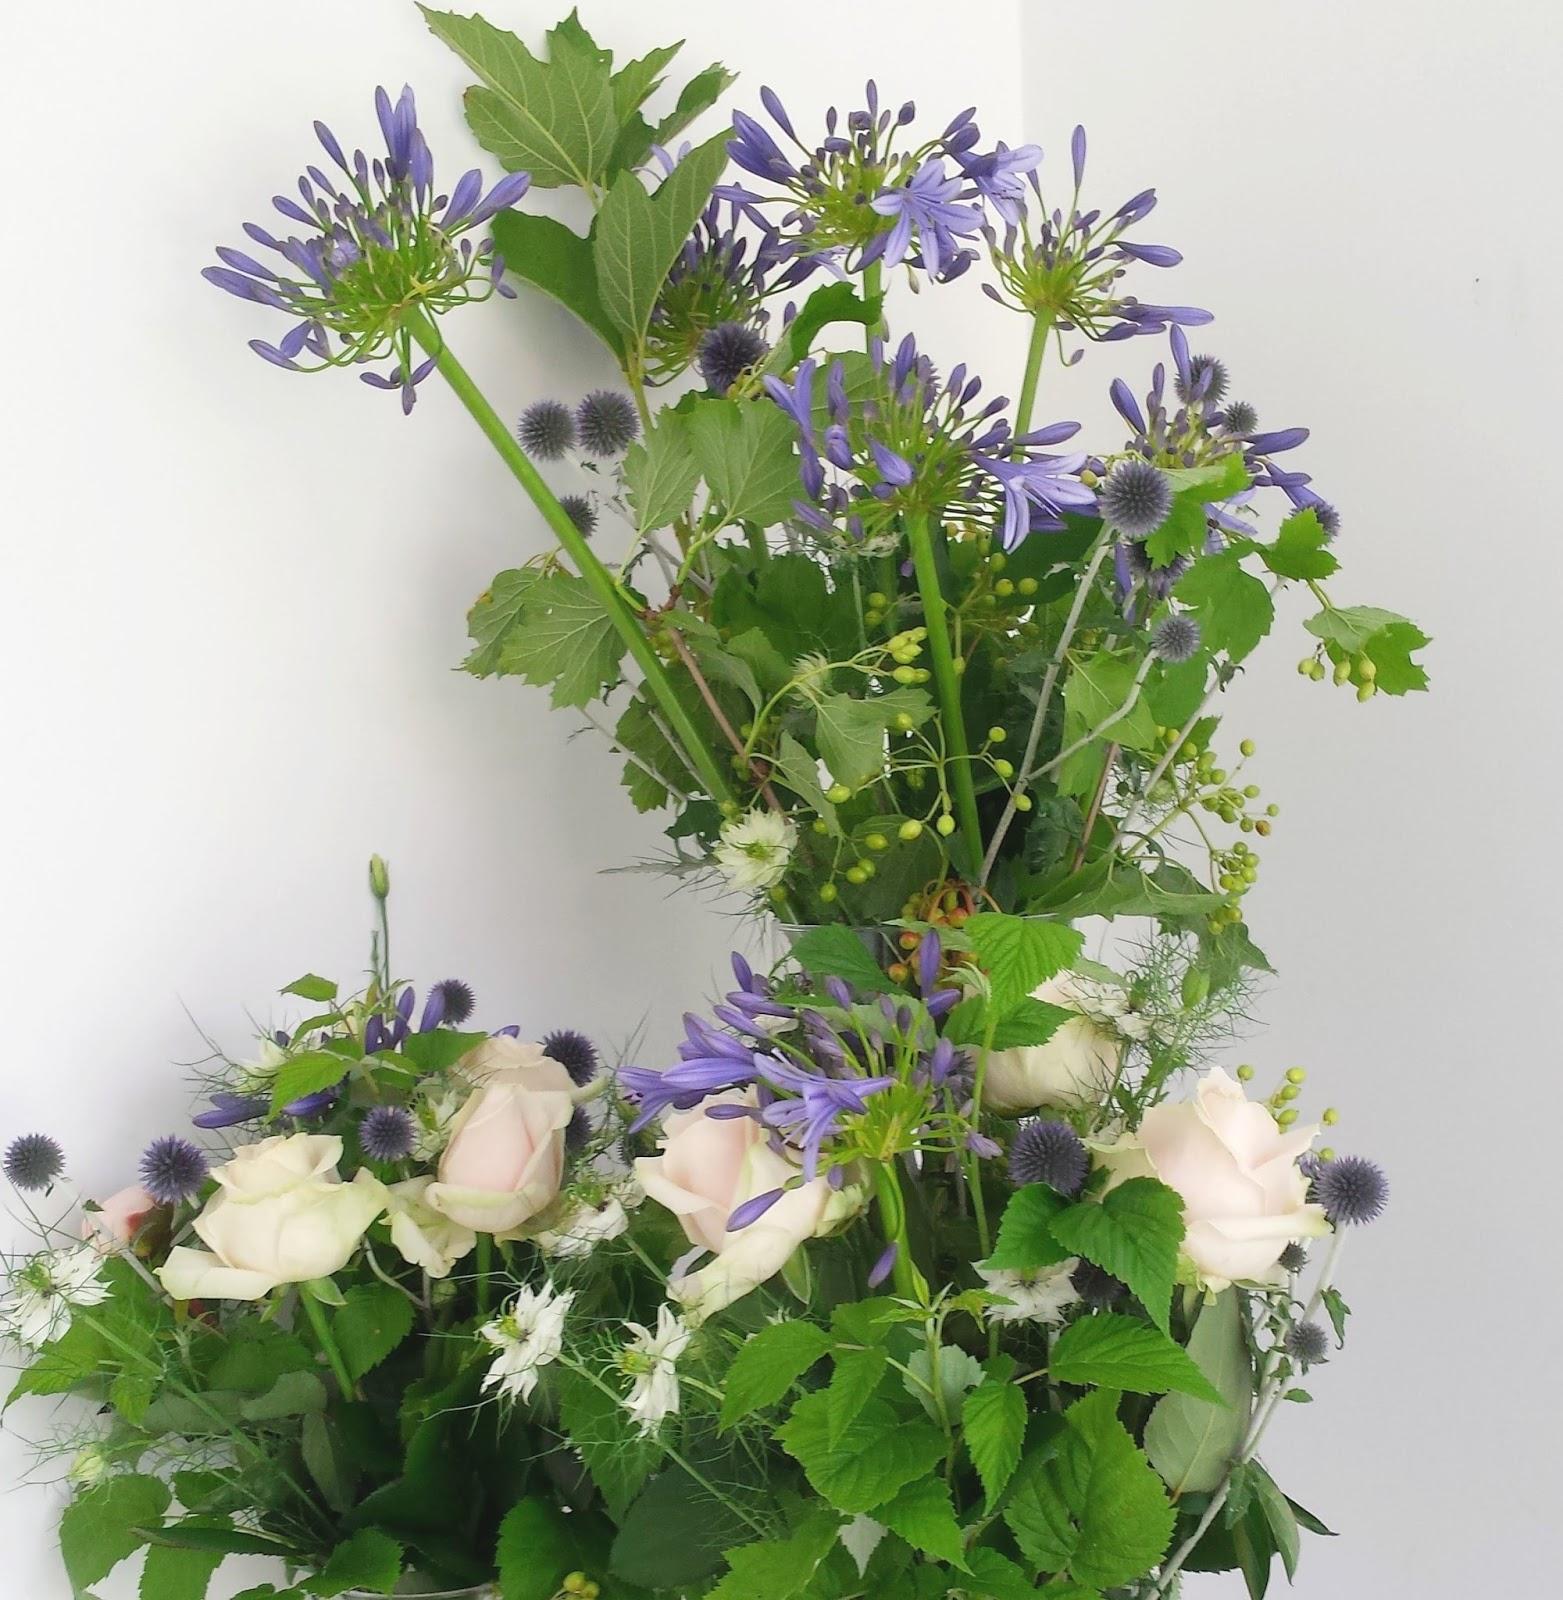 la petite boutique de fleurs fleuriste mariage lyon fleuriste mariage rh ne juin 2015. Black Bedroom Furniture Sets. Home Design Ideas